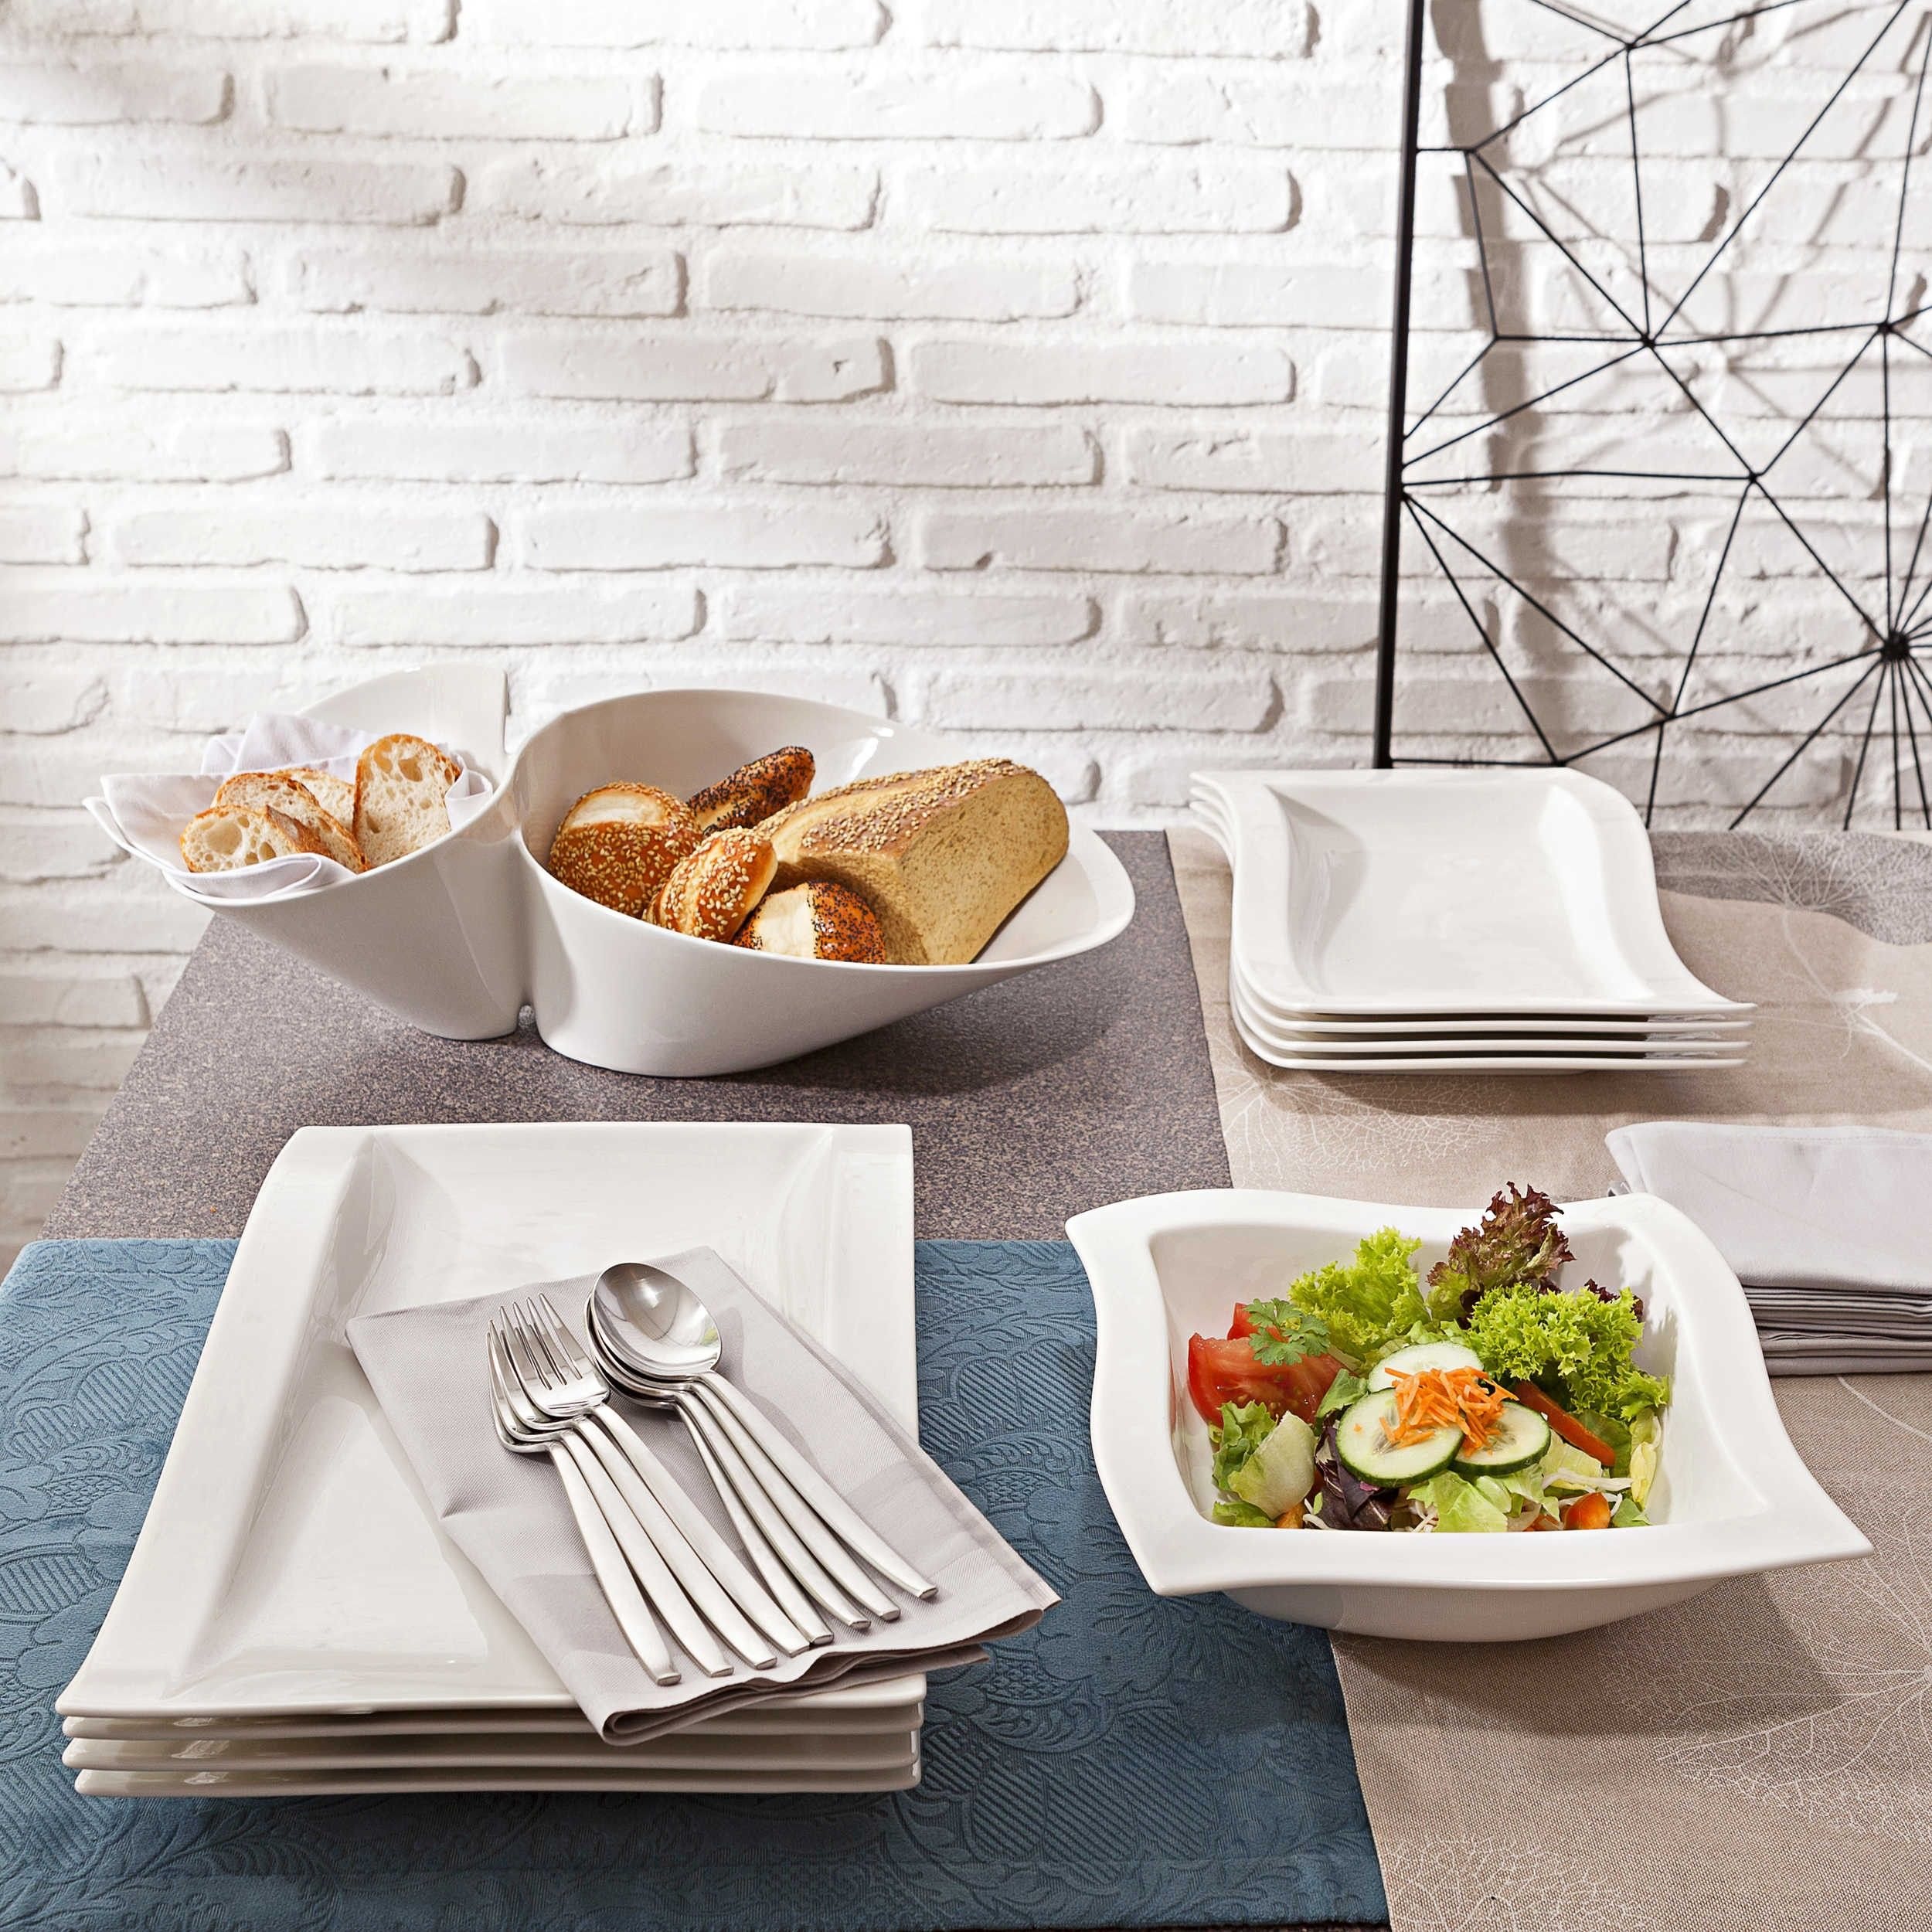 Villeroy Boch Gourmetteller New Wave 37 X 25 Cm Platten Schusseln Geschirr Haushalt Schones Geschirr Essen Schussel